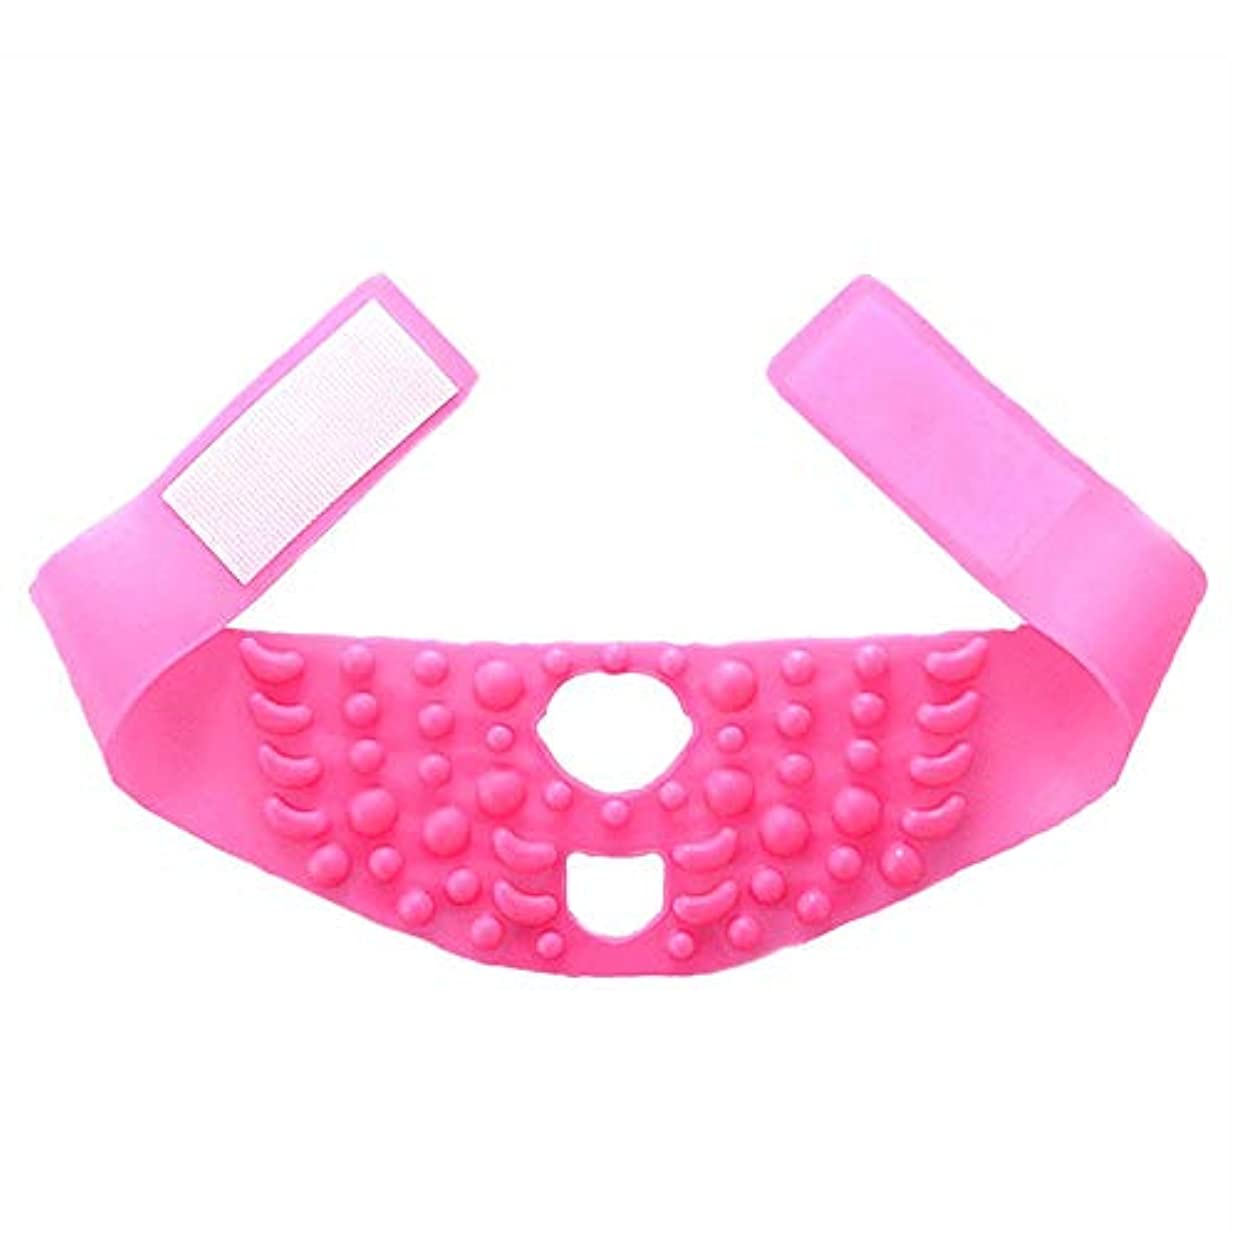 Jia Jia- シンフェイスマスクシリコーンマッサージ引き締まった形の小さなVフェイスリフティングに薄いフェイスアーティファクト包帯を飾る - ピンク 顔面包帯